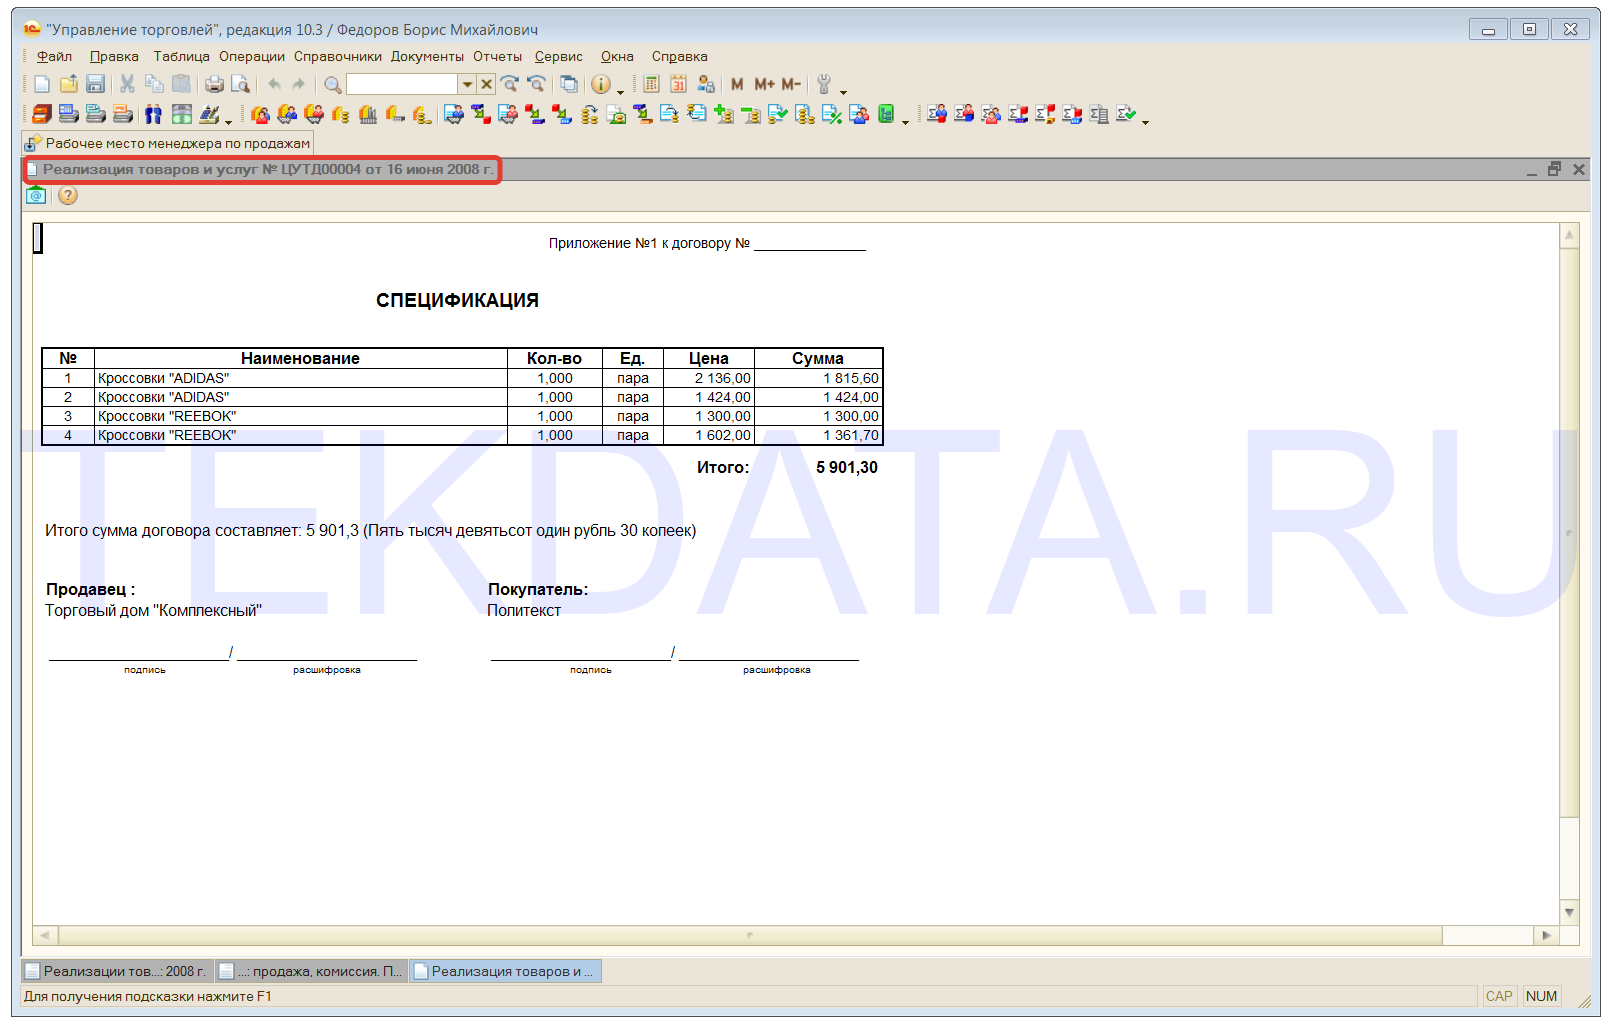 Спецификация к договору 1С 8.2 - УТ 10.3 (Рис. rtu-2) | tekdata.ru